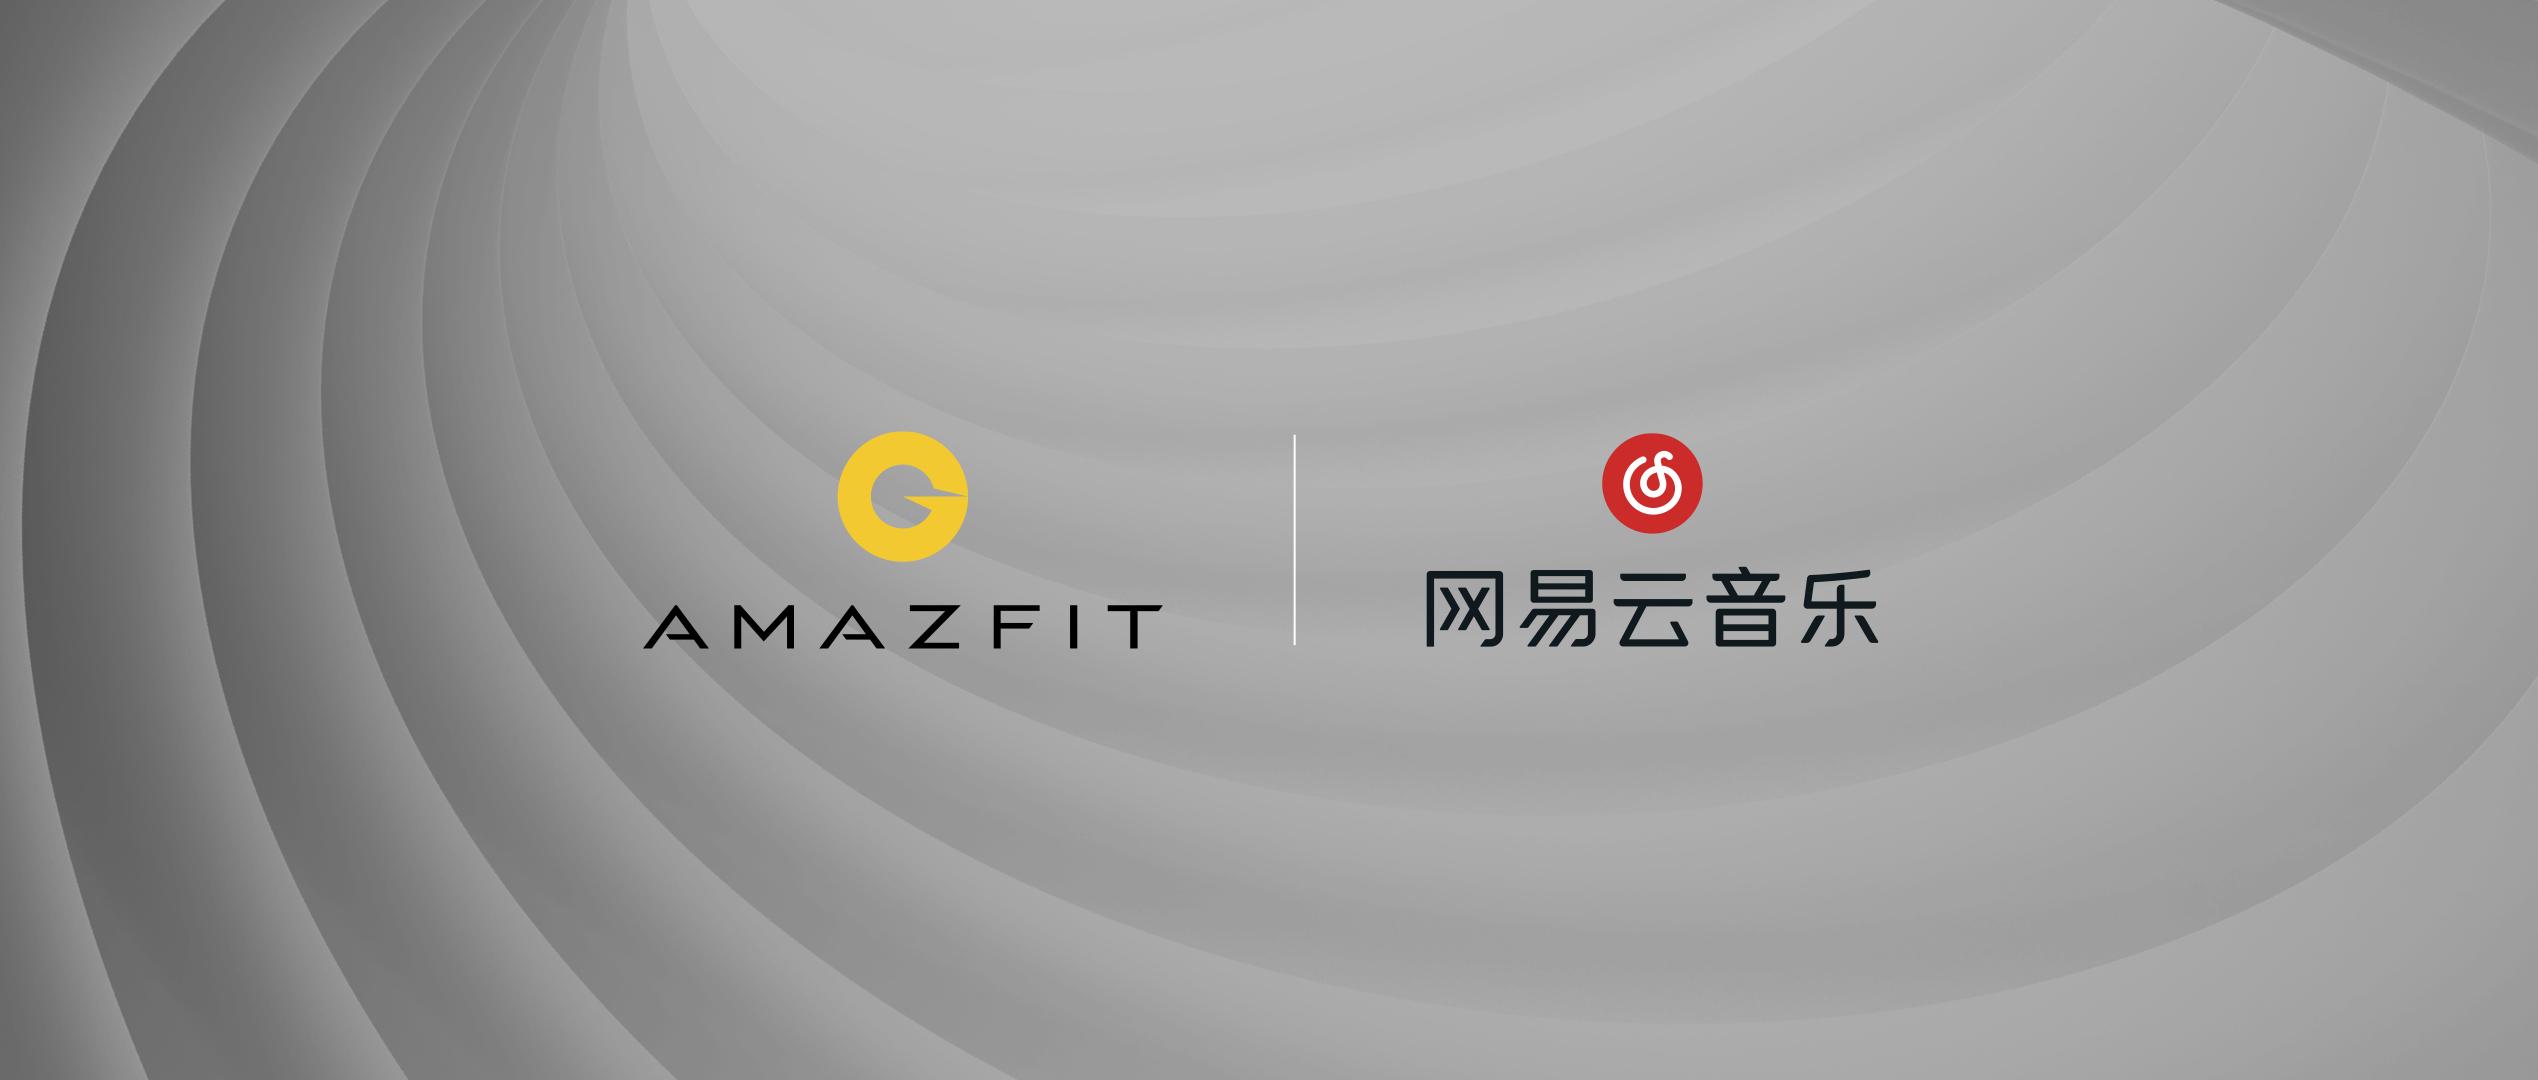 GT 2 发布会一彩版 0921上午.001.jpeg